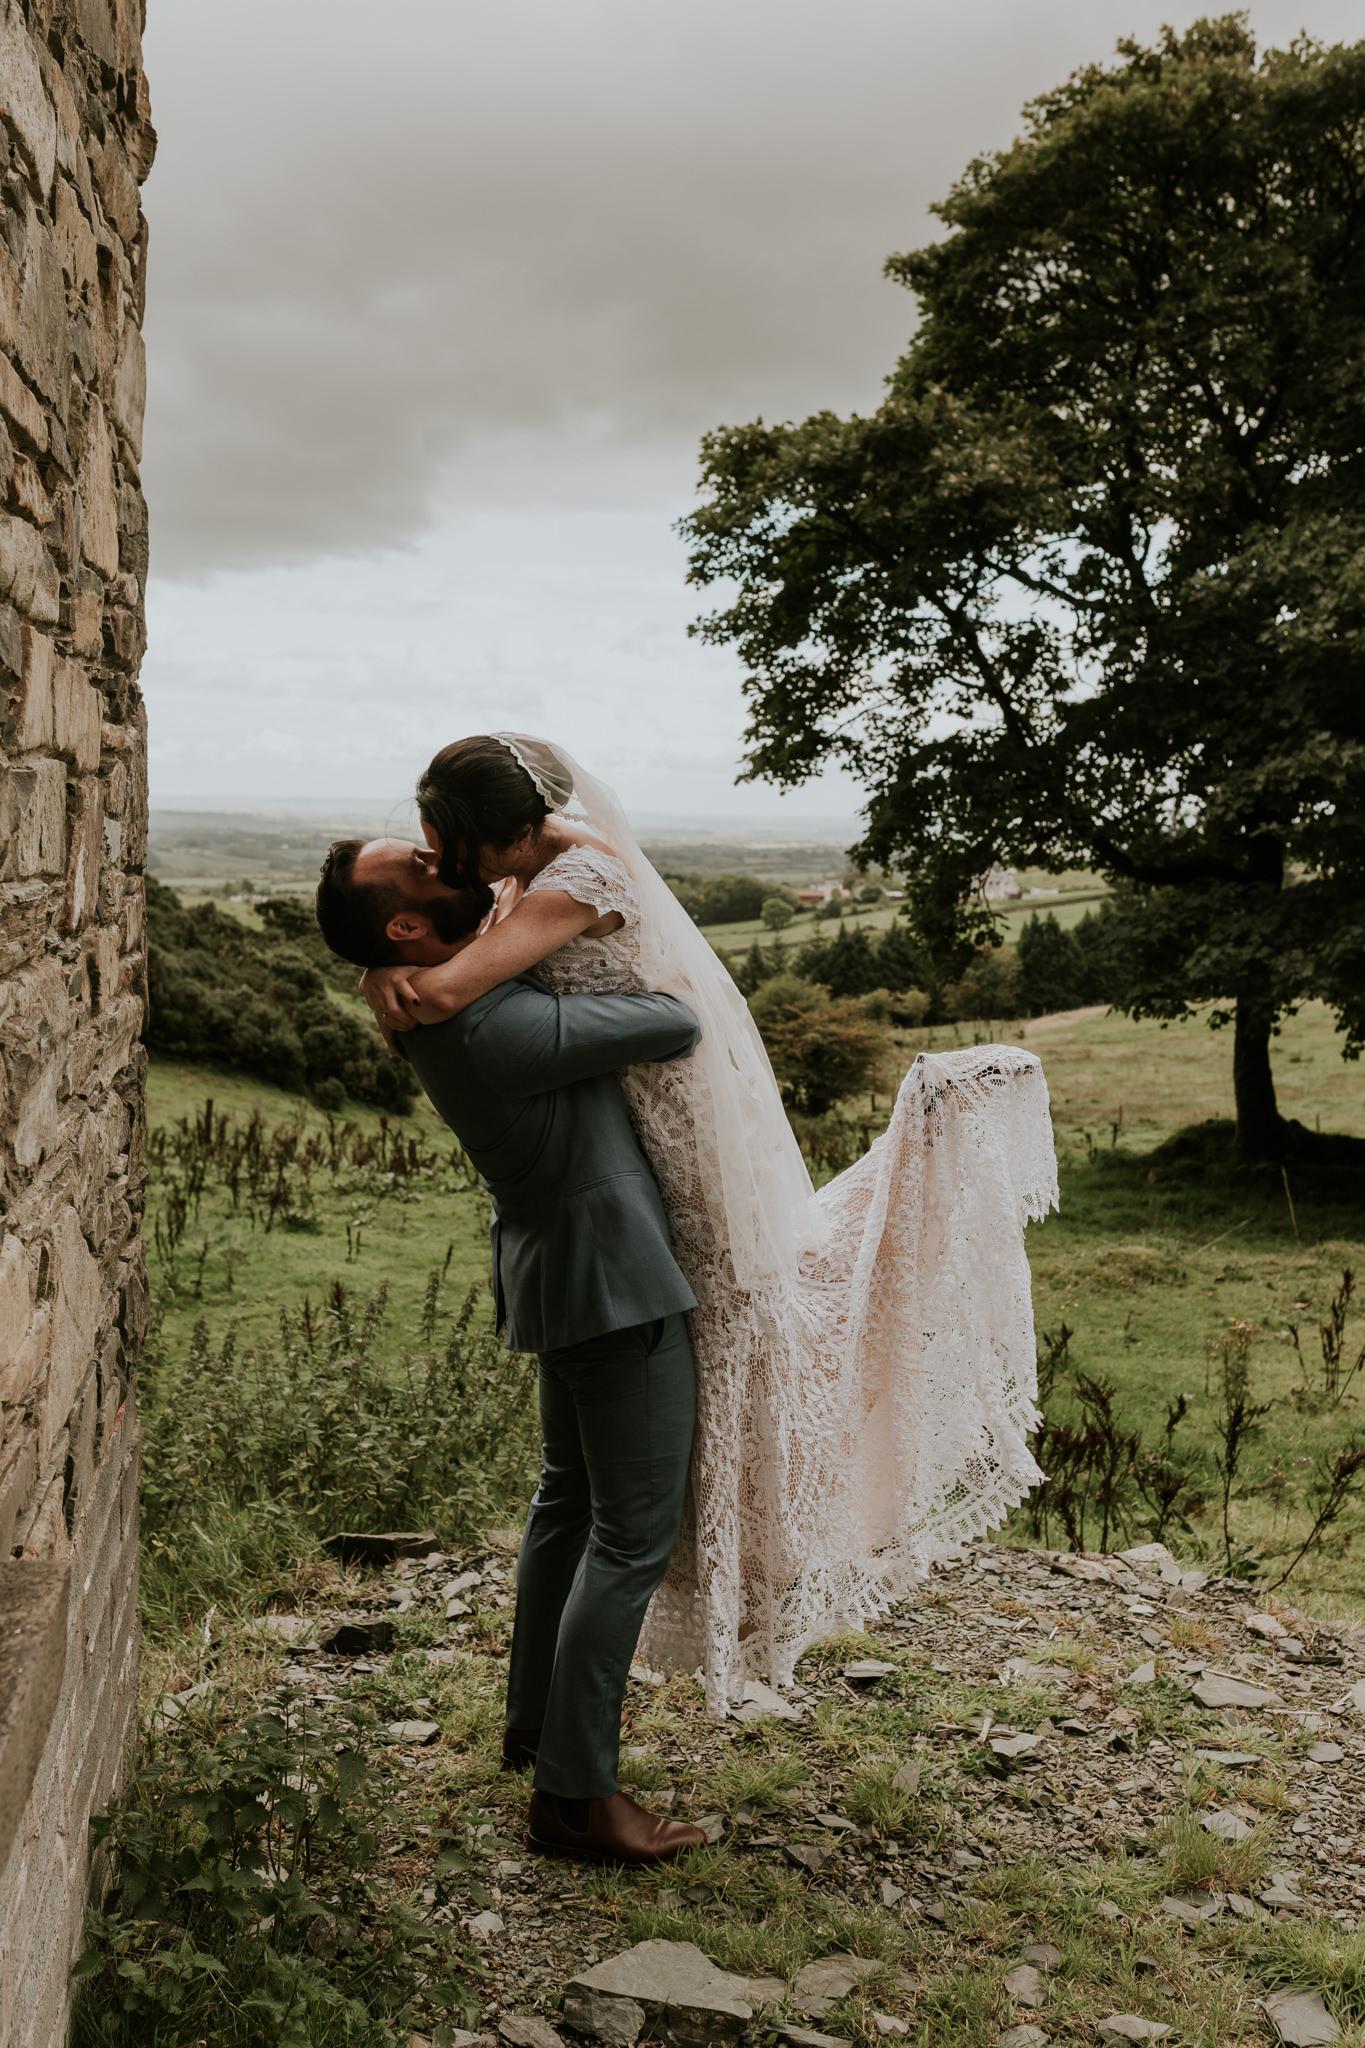 Jamie&Steve_Ireland_KristieCarrickPhotography_SCREEN-656.jpg